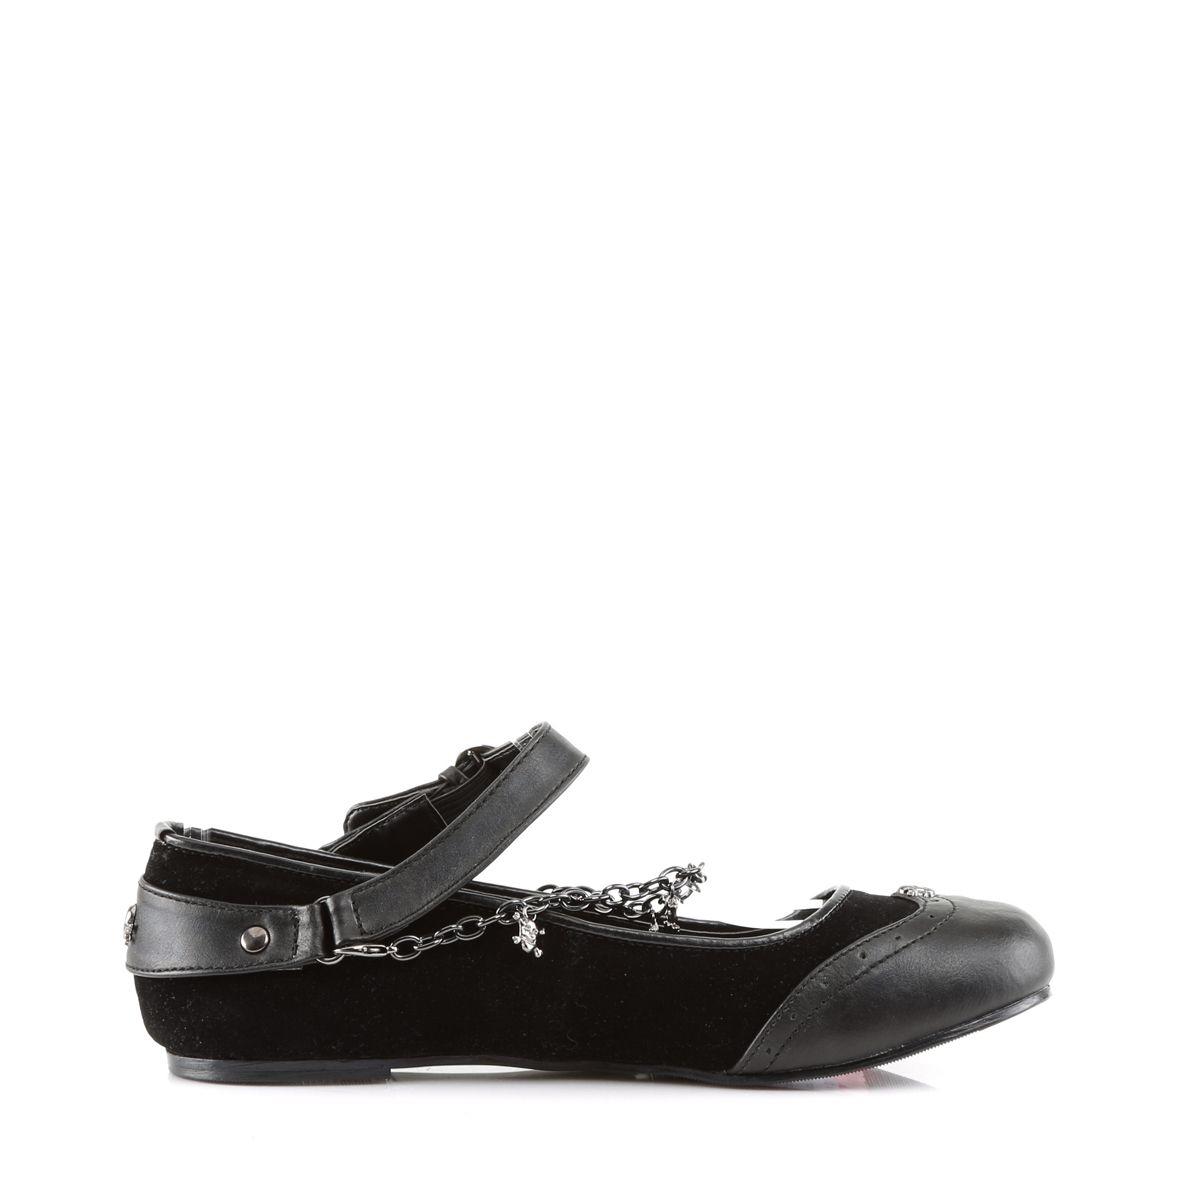 Sapato Daisy 07 - Demonia (encomenda)